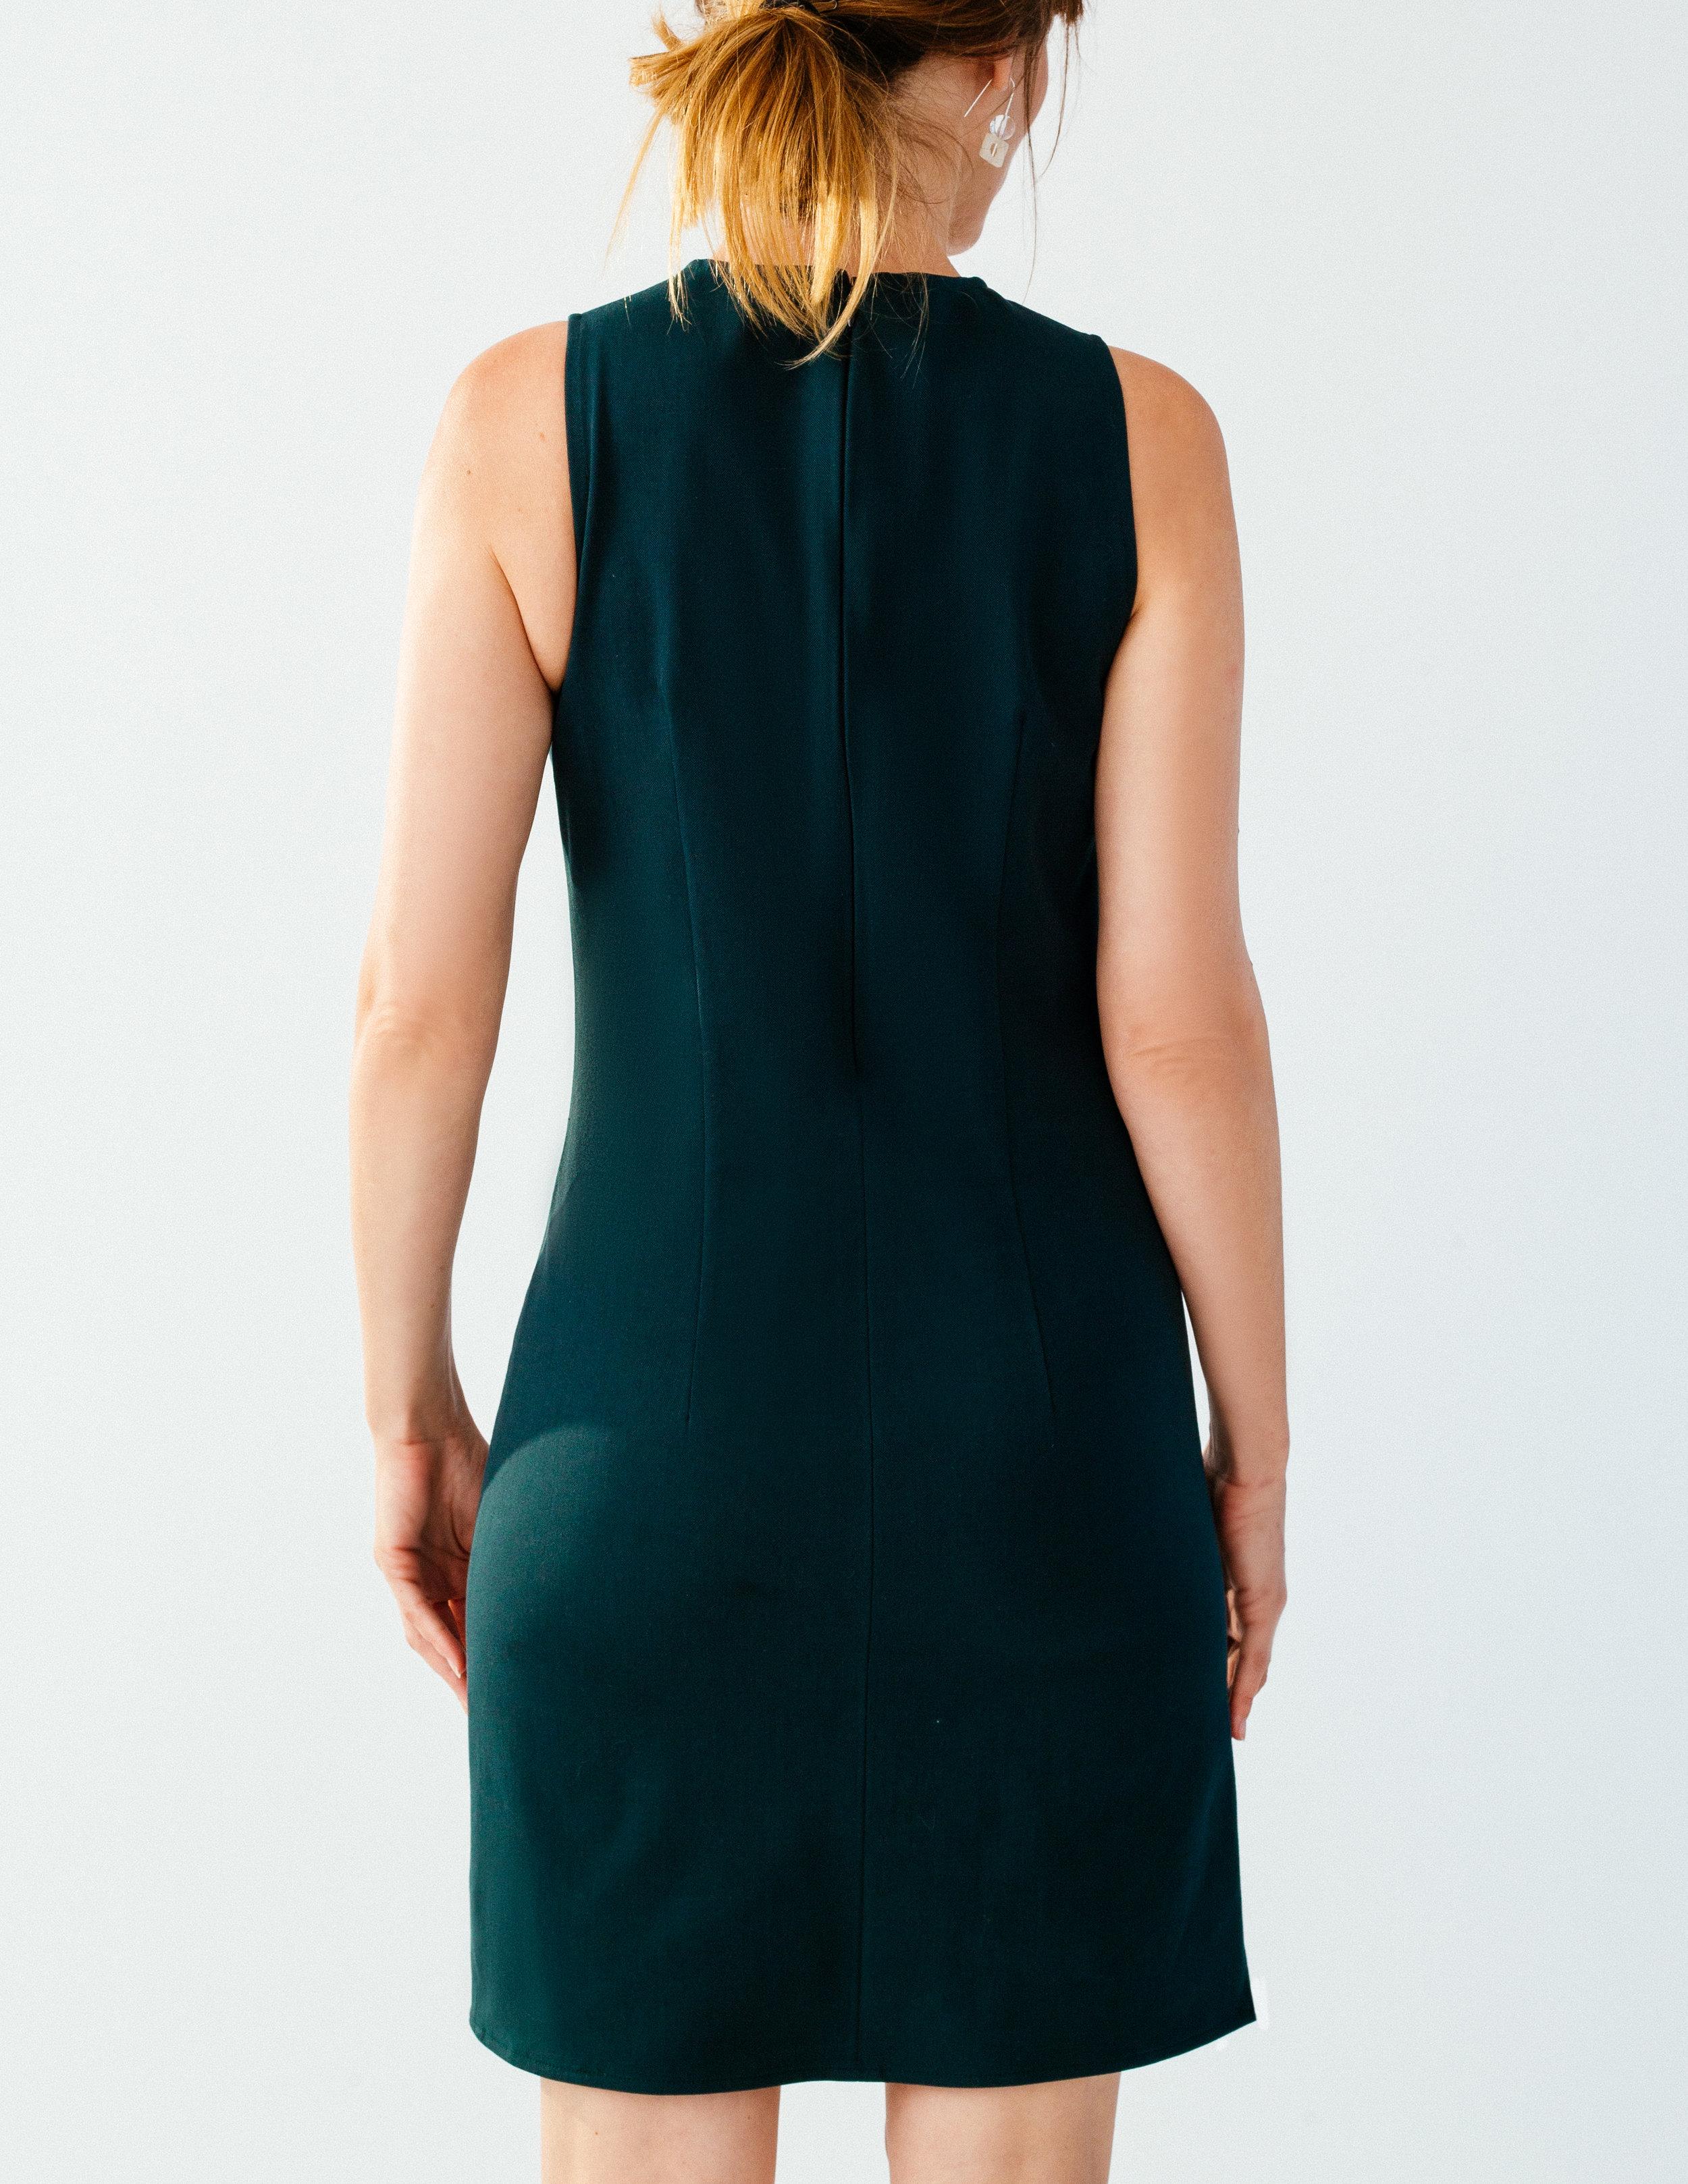 ellice ruiz_sustainable workwear_dress.jpg